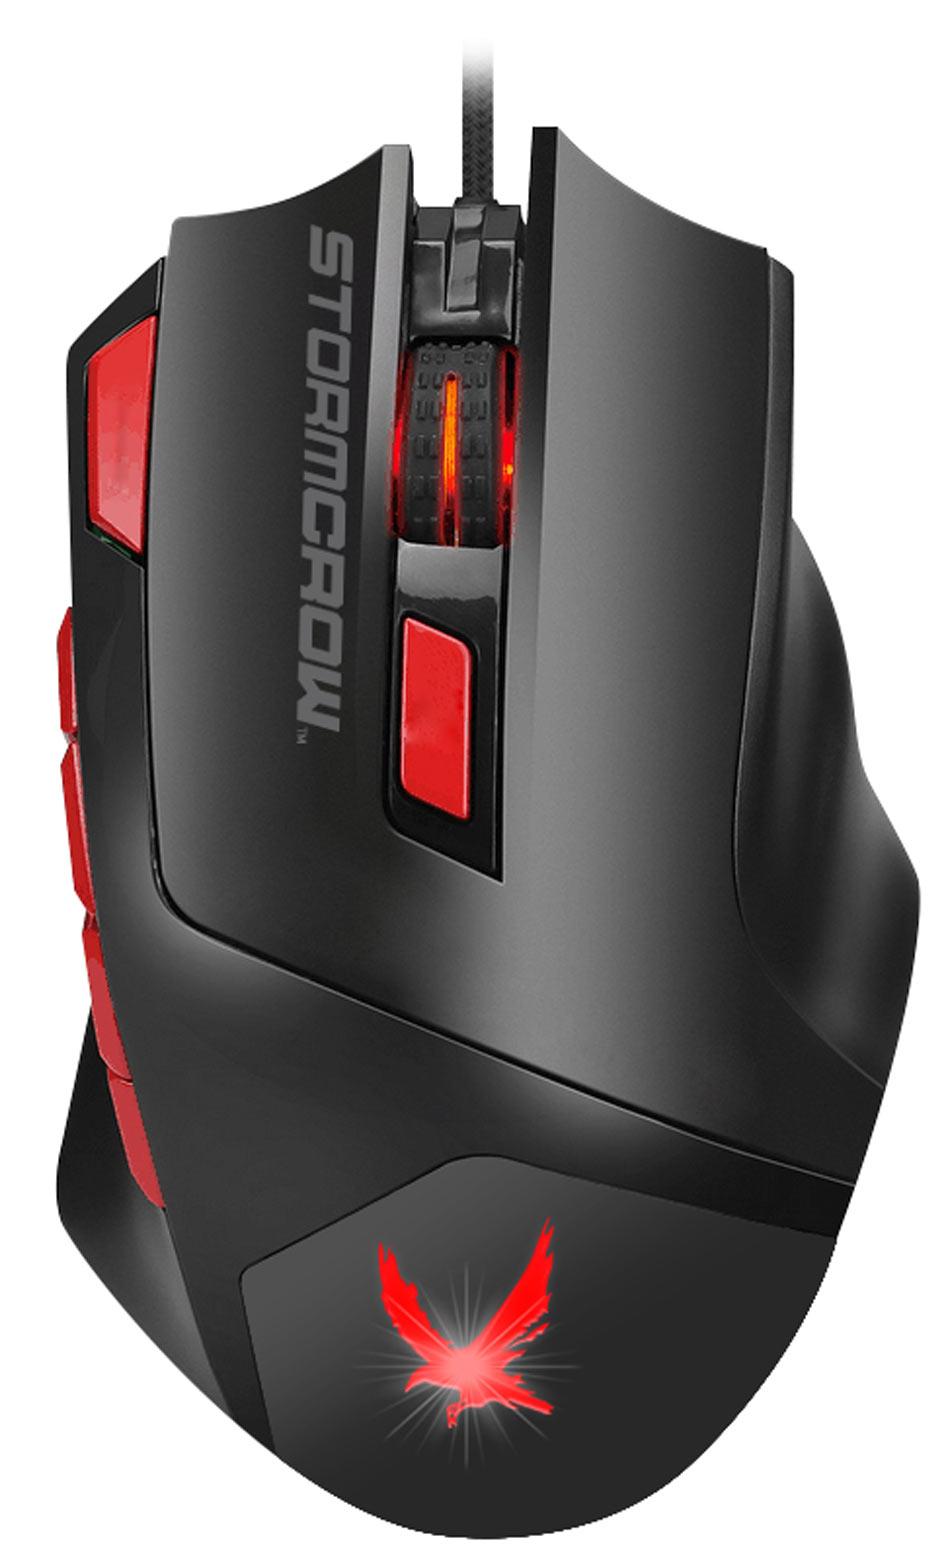 StormCrow Bundle @Play - PC Gaming